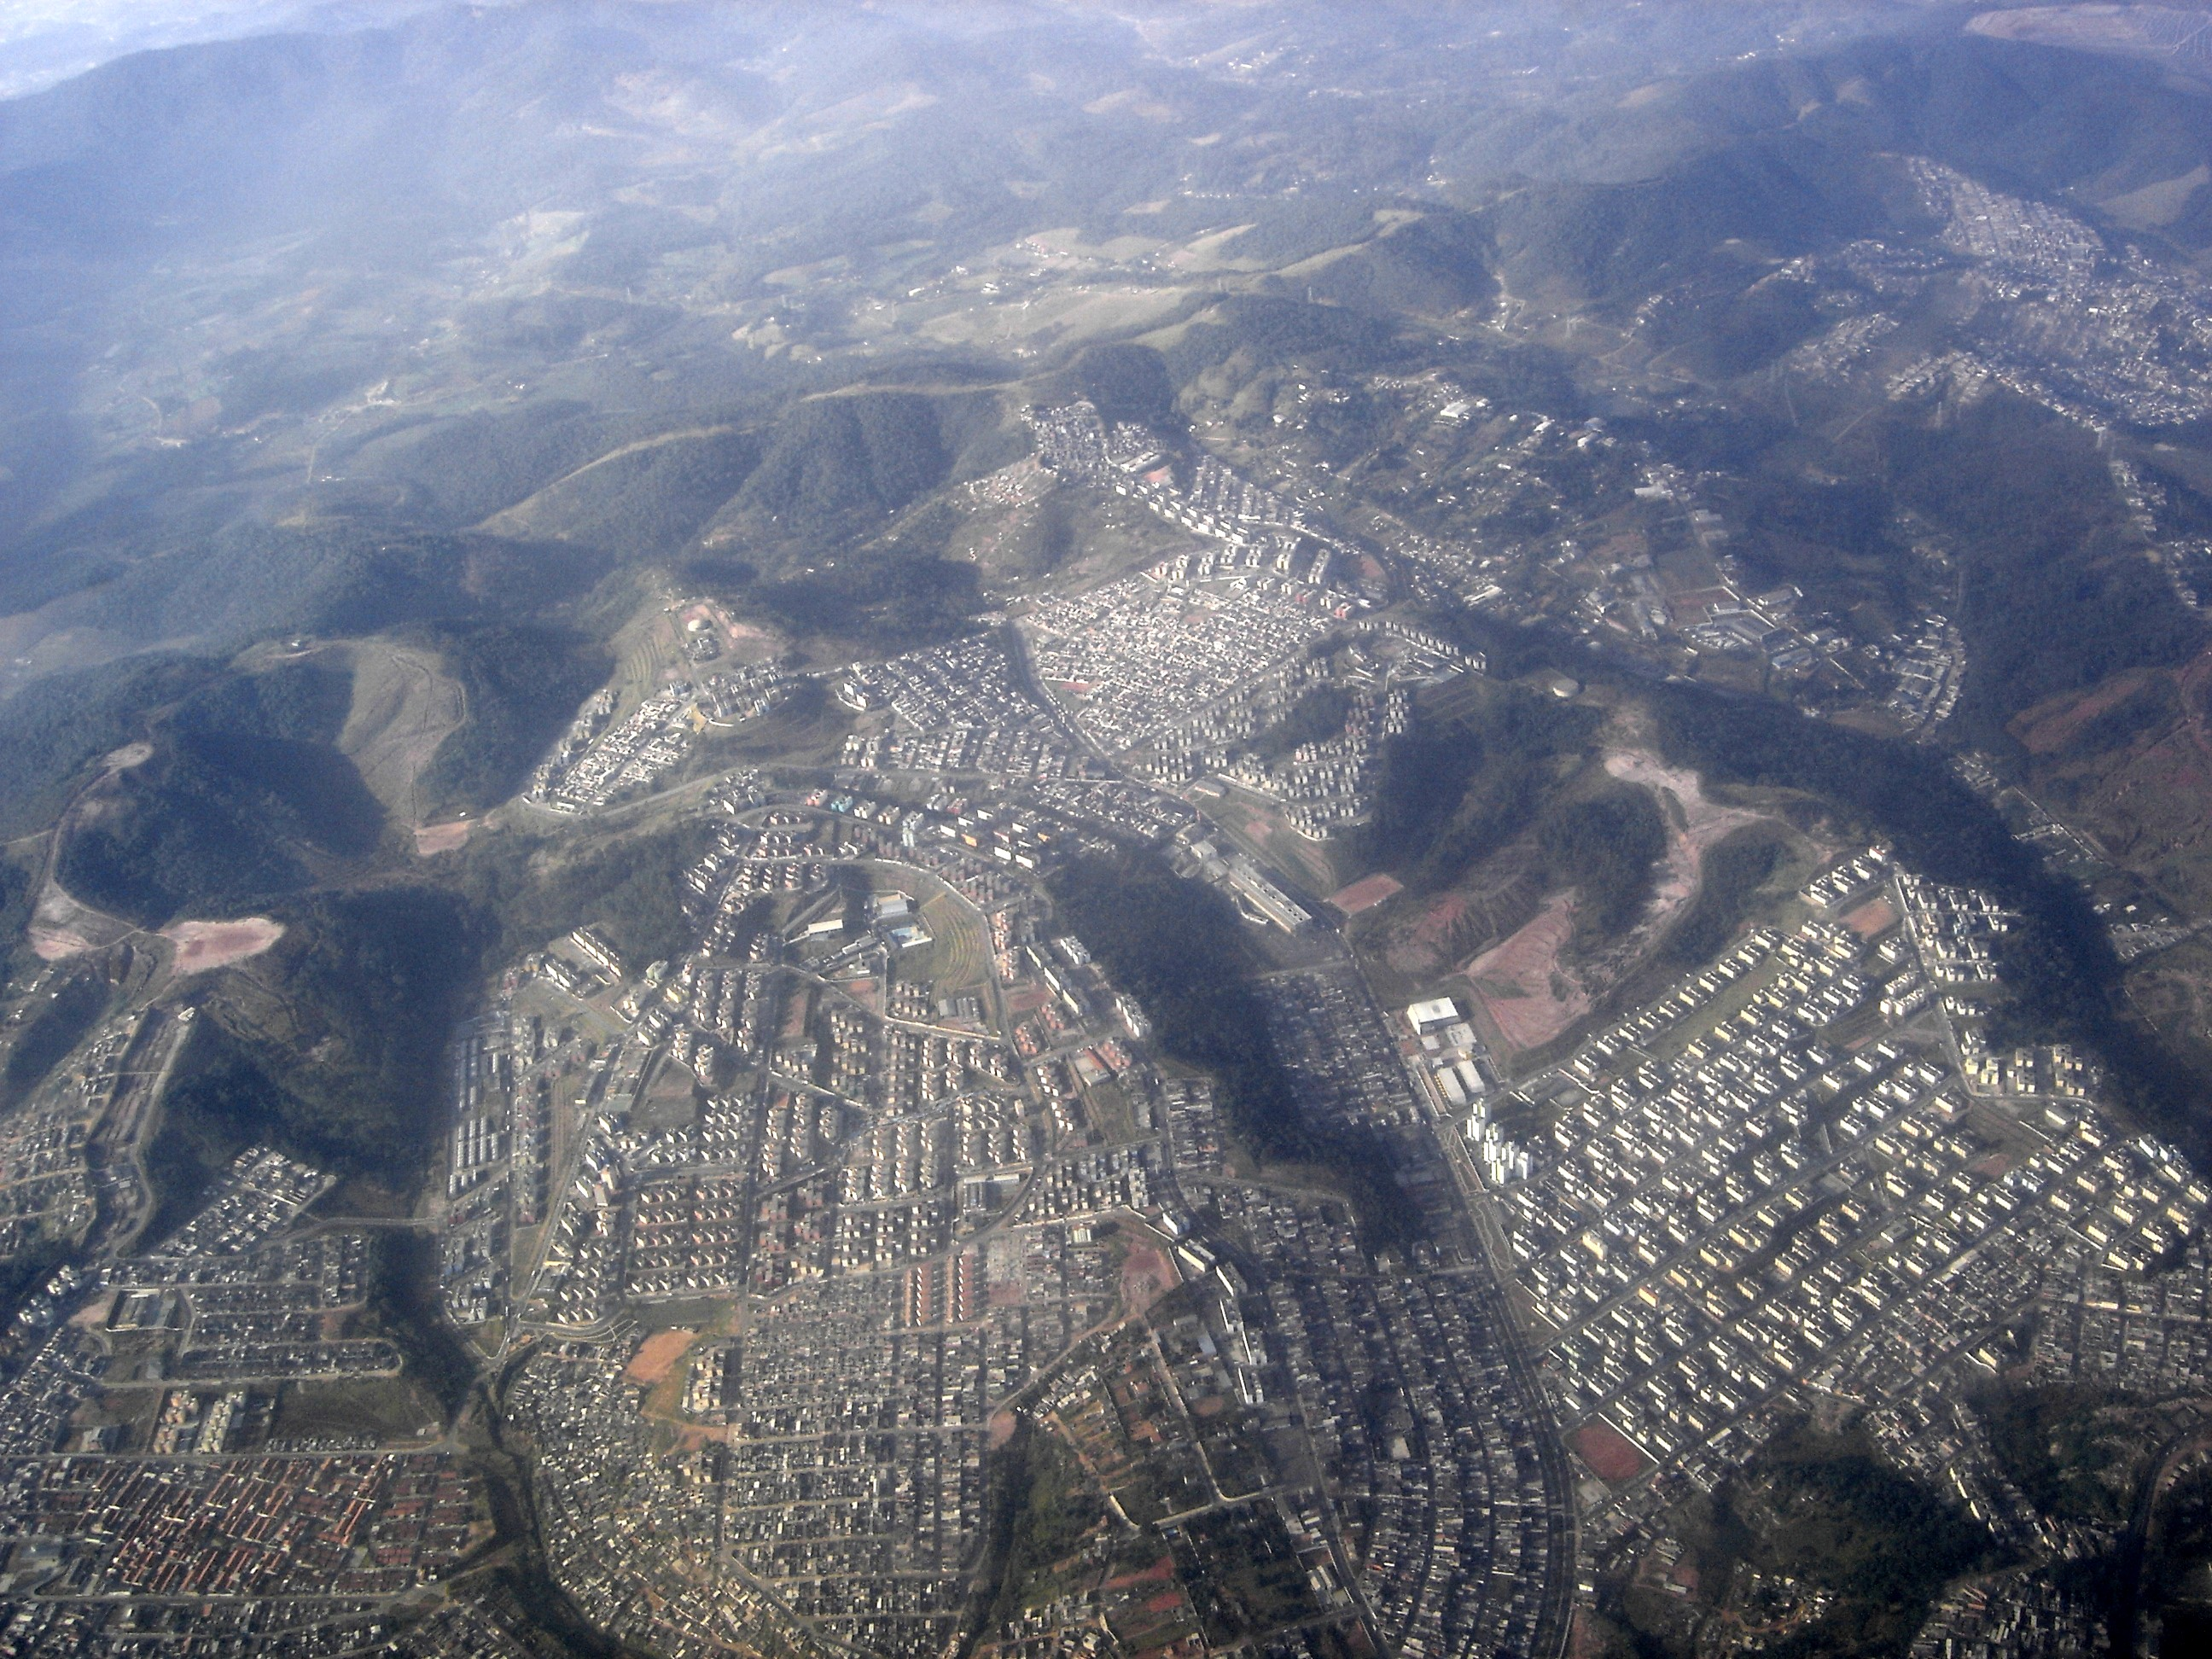 jardim pedra branca cidade tiradentes:Tiradentes Cidade De Sao Paulo